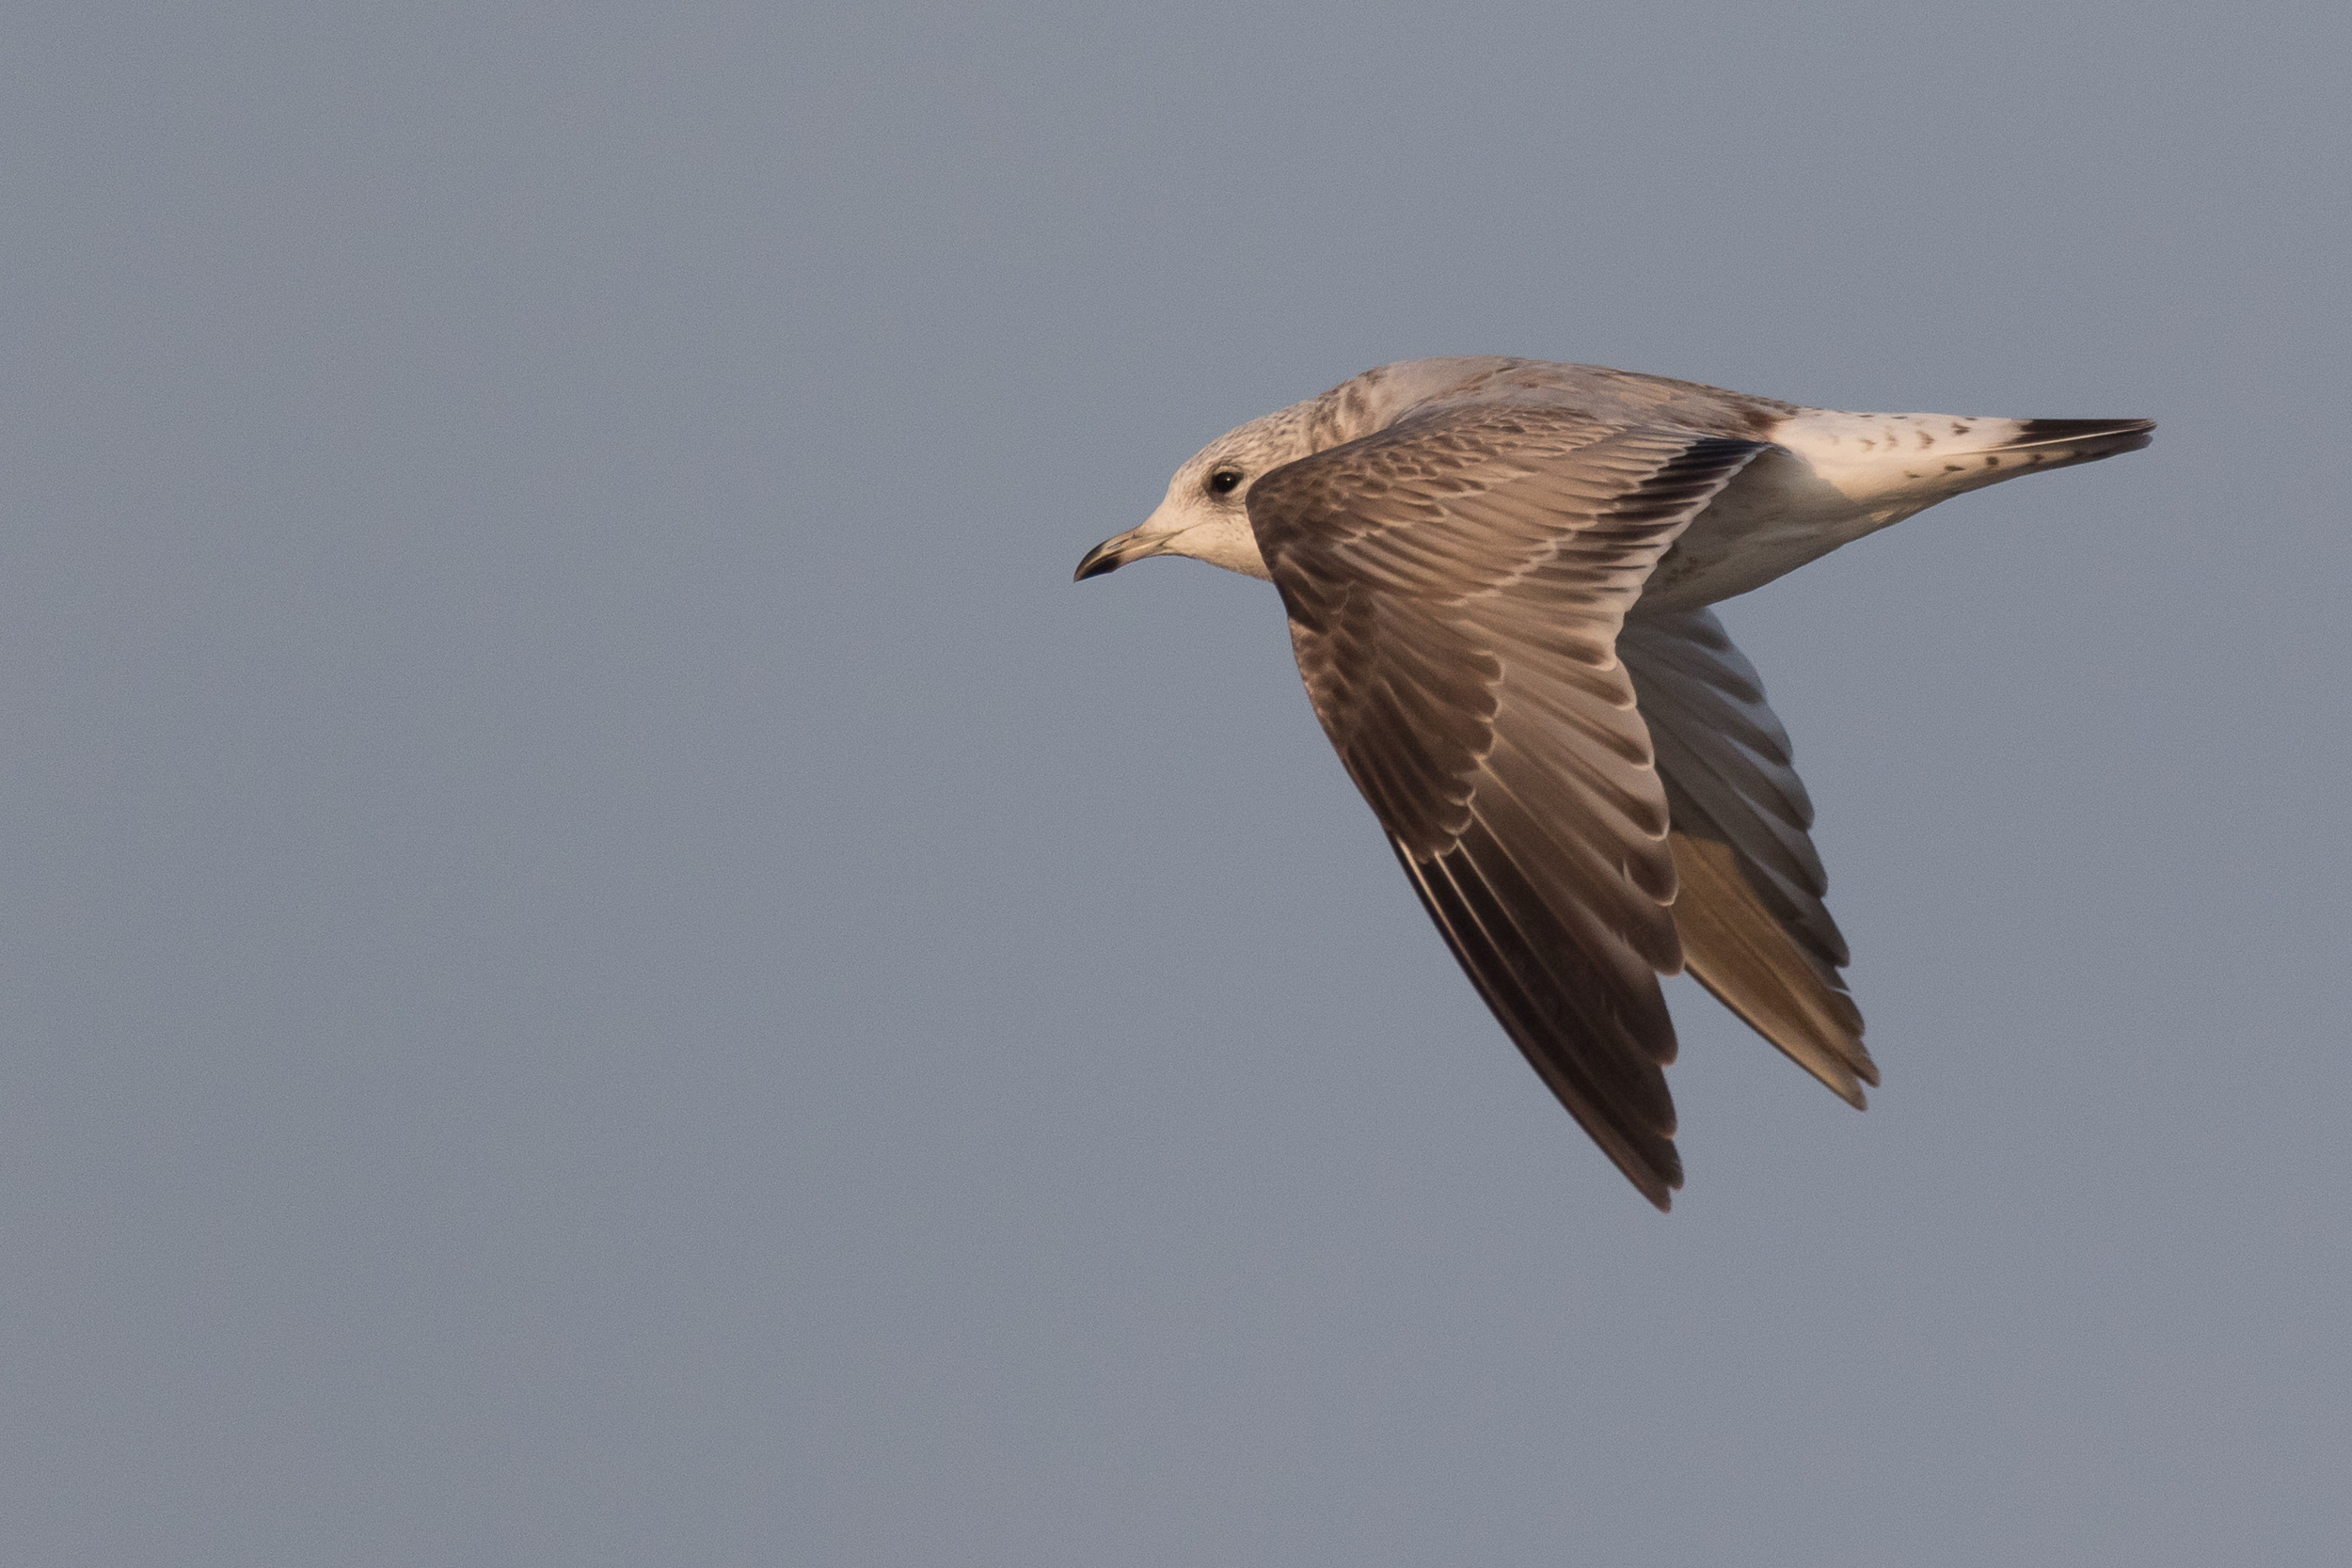 20170126-Common Gull 2CY-31.jpg